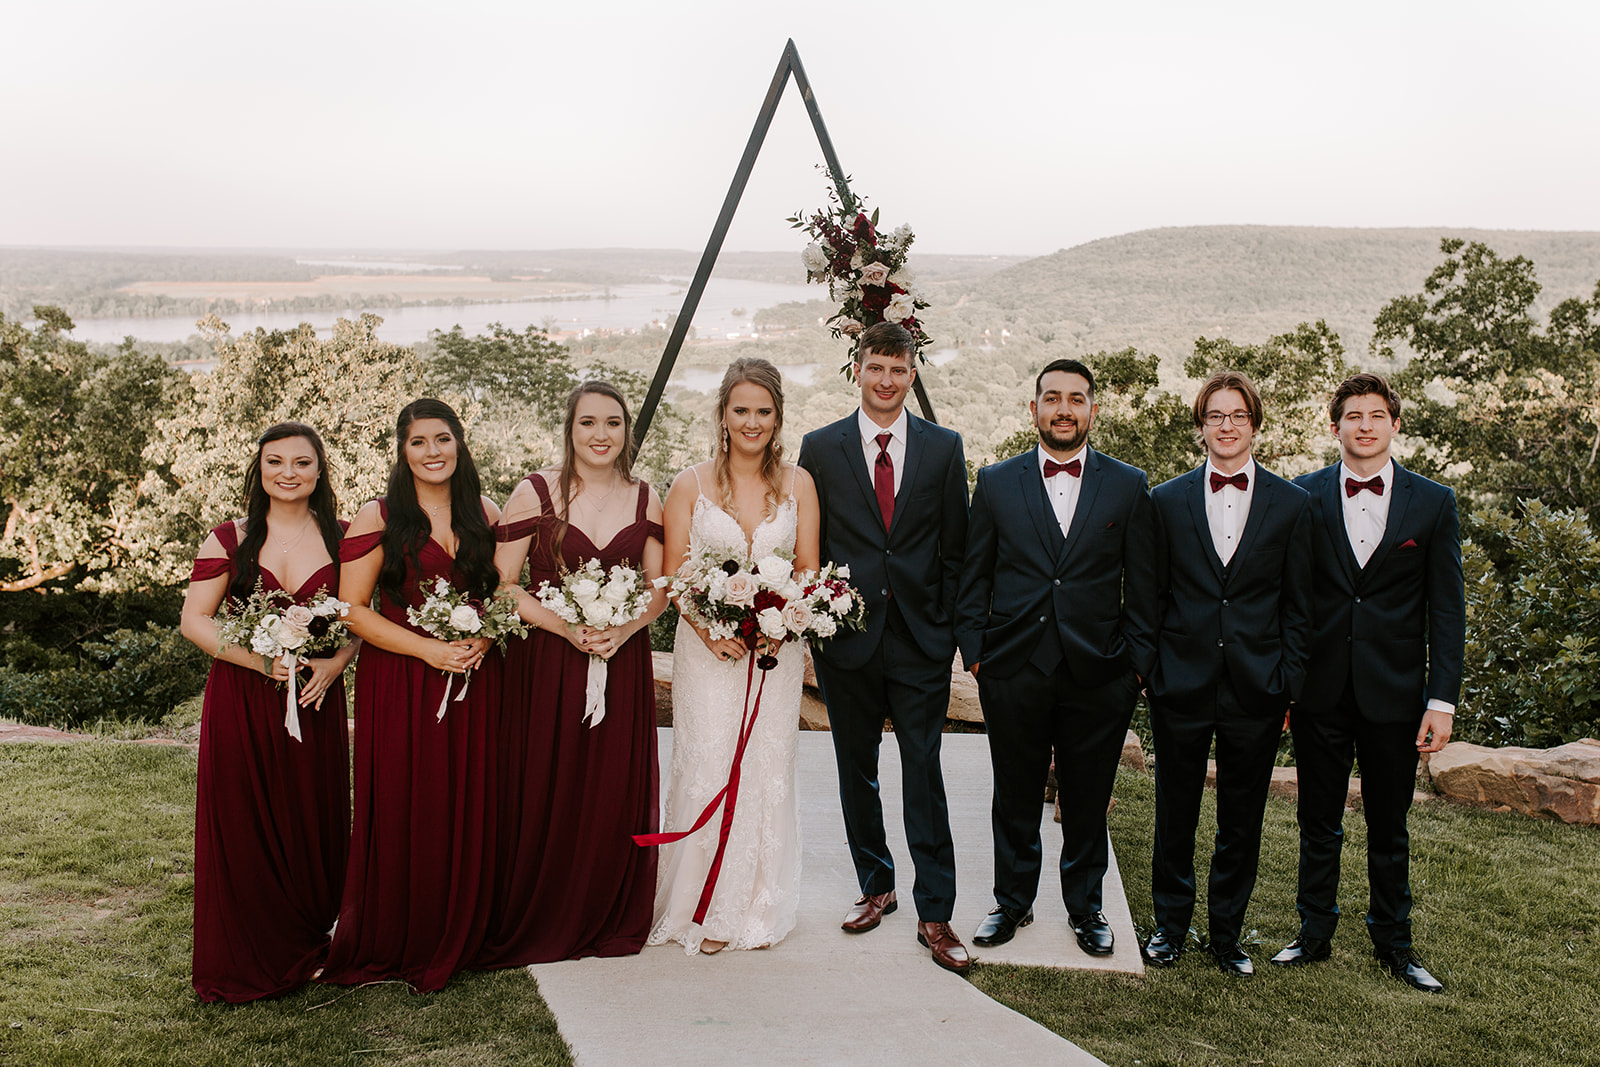 Wedding Venues in Tulsa white barn Dream Point Ranch 27.jpg